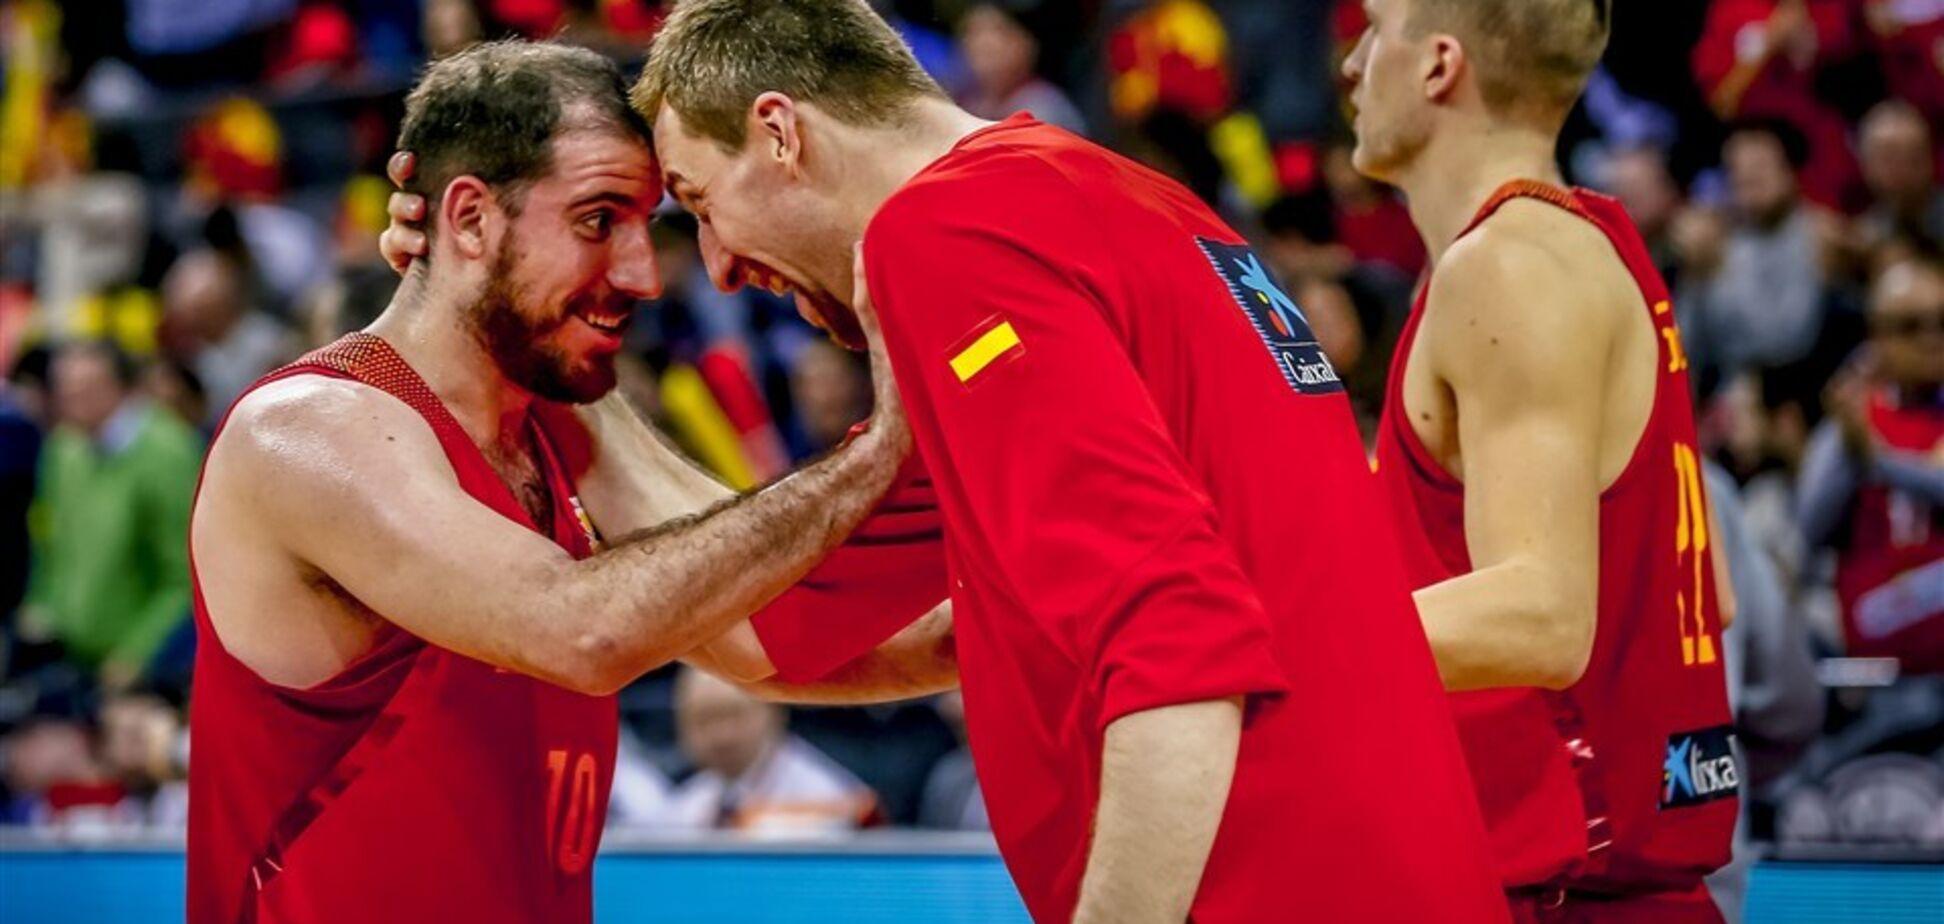 Без звезд НБА: Испания назвала состав на матч с Украиной в отборе КМ-2019